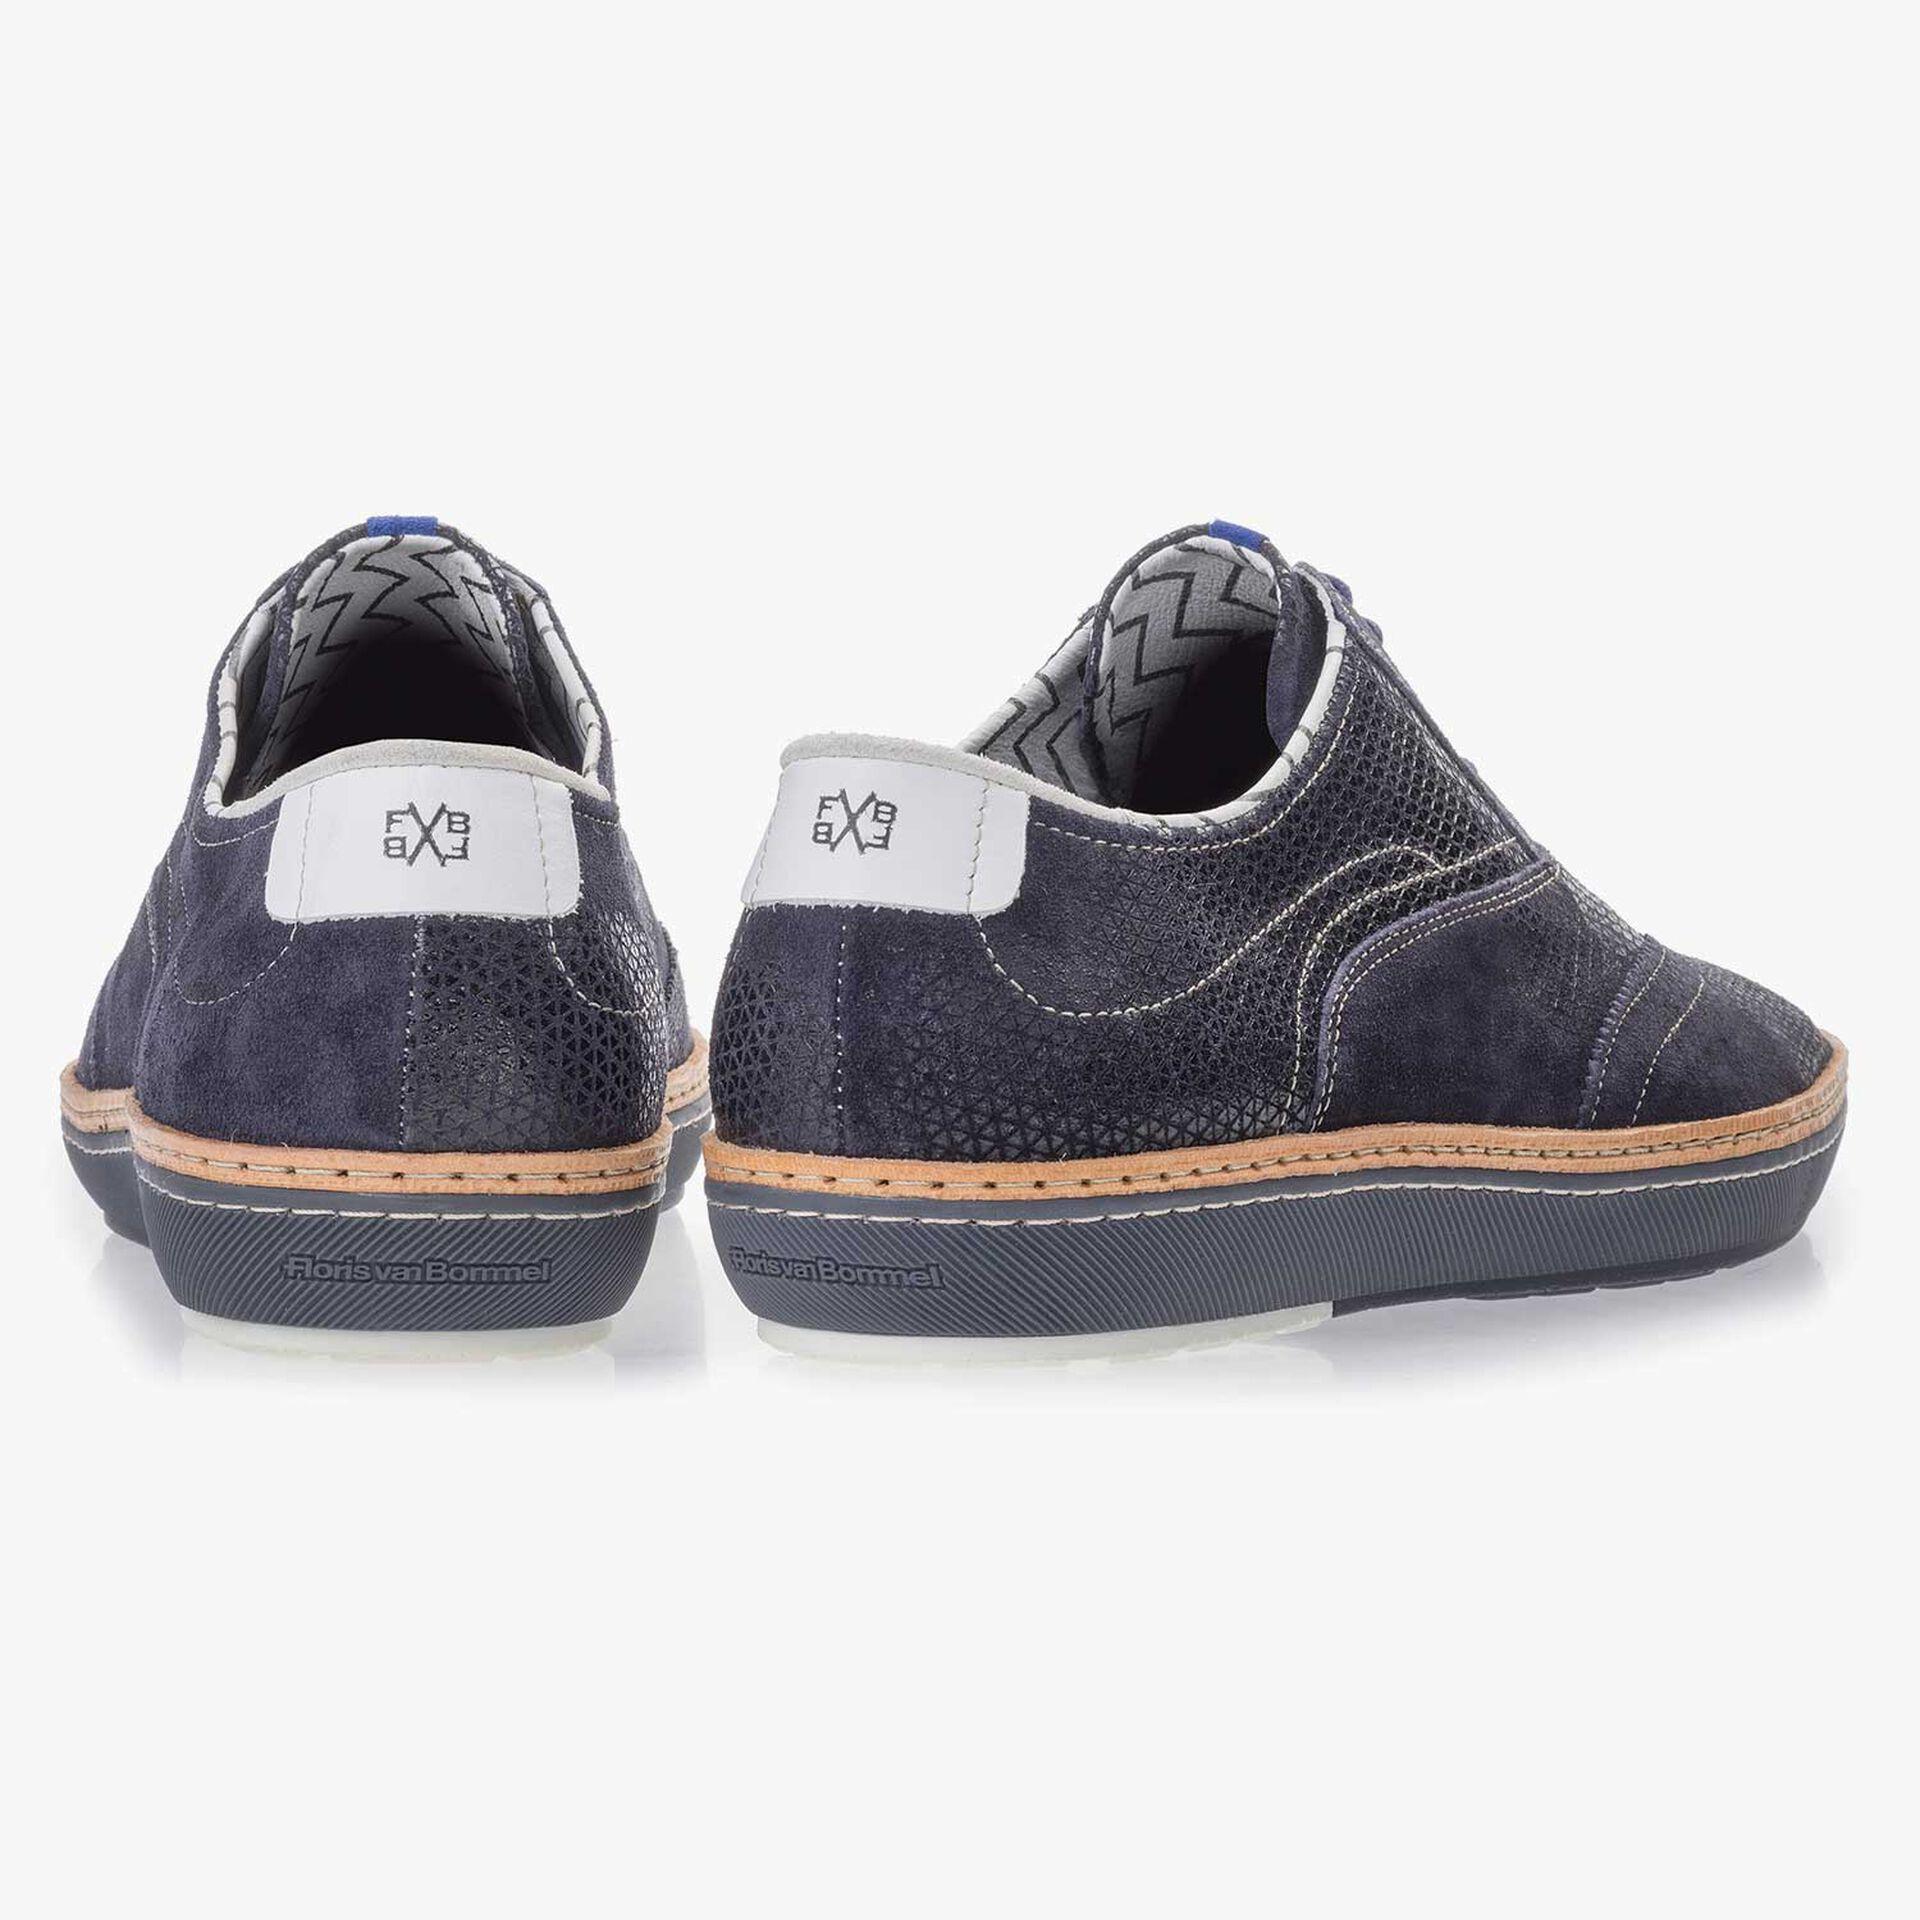 Dark blue brogue suede leather sneaker